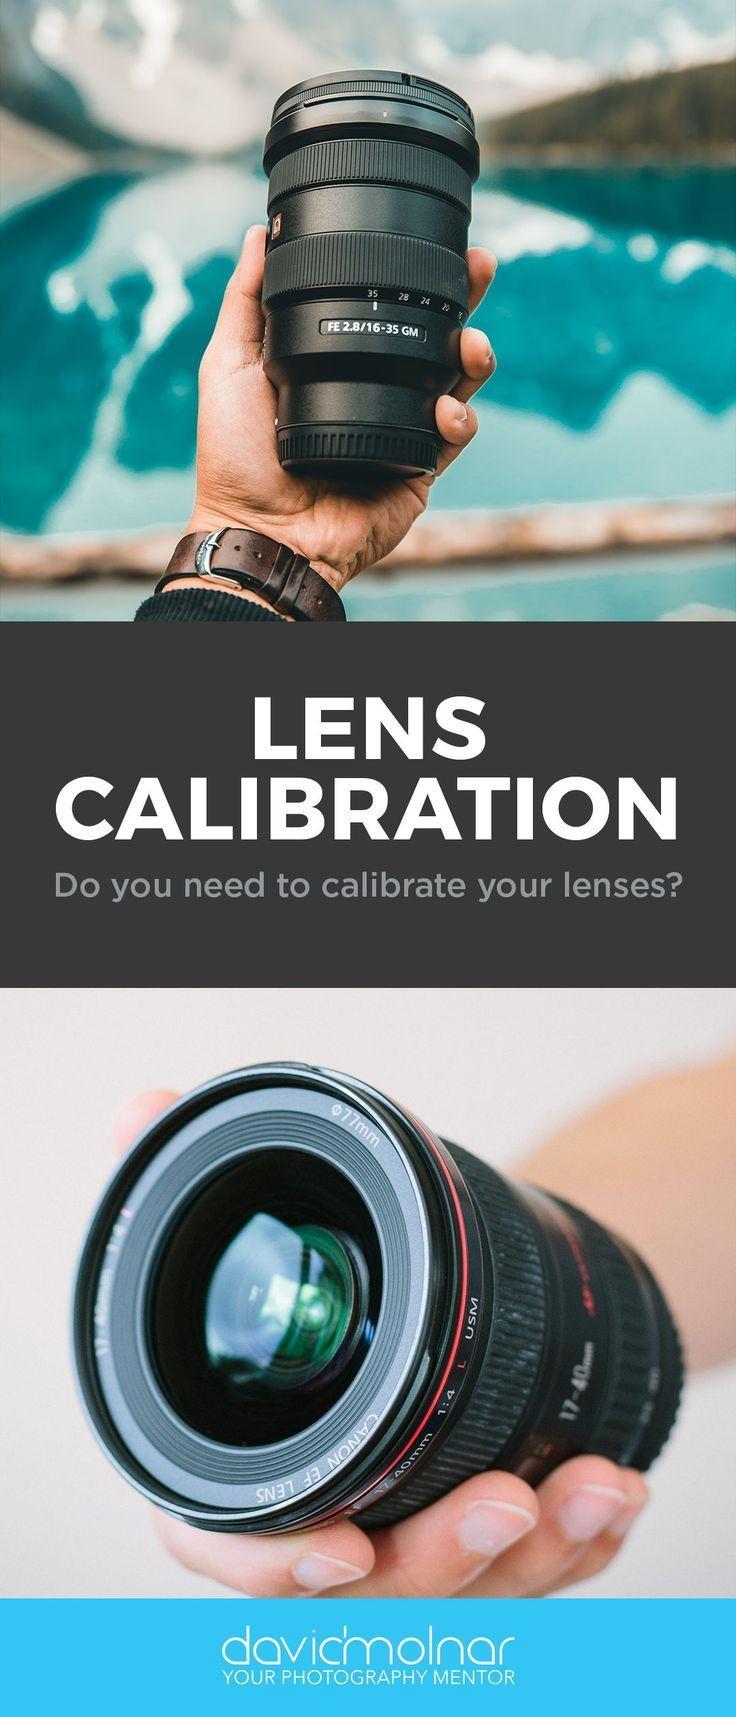 Lens Calibration For Tack Sharp Focus Camera Gear Camera Lens Dslr Camera Gear